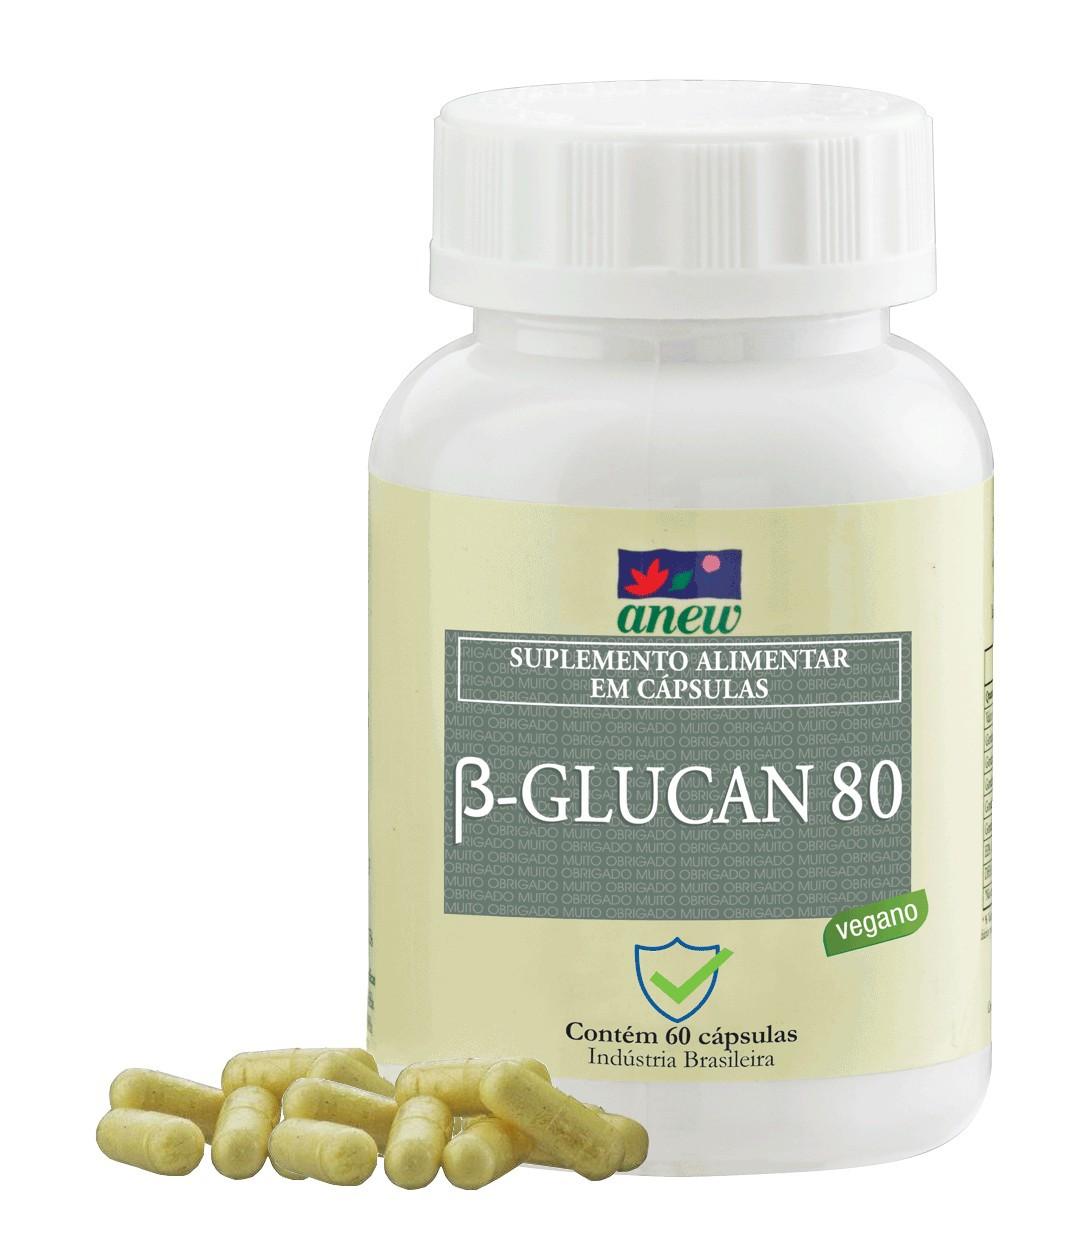 B-Glucan 80 Anew 60 cáps